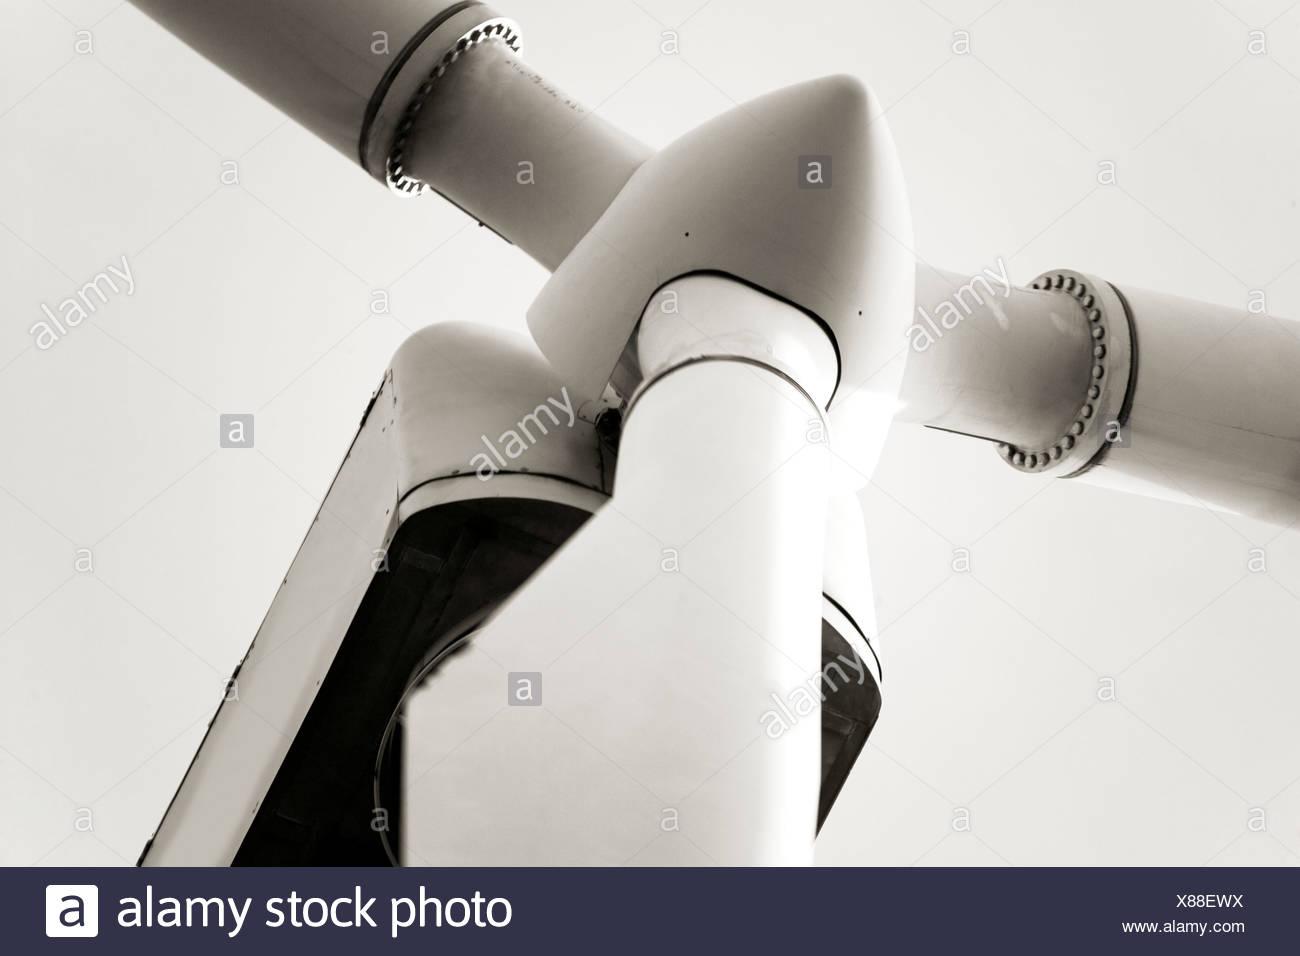 Wind turbine, close-up - Stock Image